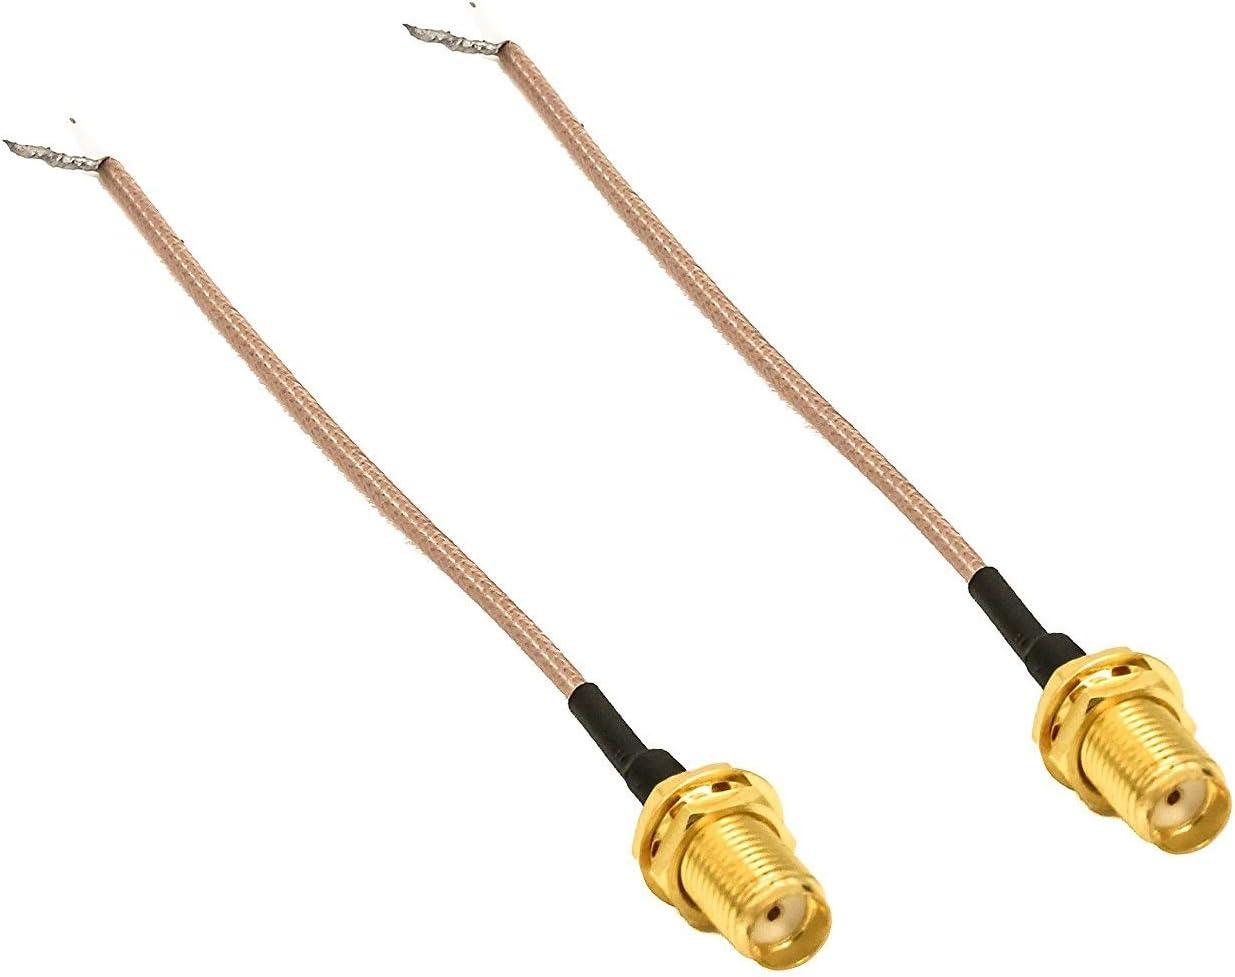 Technikkram Antena SMA de 868 MHz para CCU3 CCU2 Raspberry Pi CUL USB CC1101 GSM ELV Kit de montaje RaspberryMatic pivCCU Homematic Pigtail Cable (2 x ...